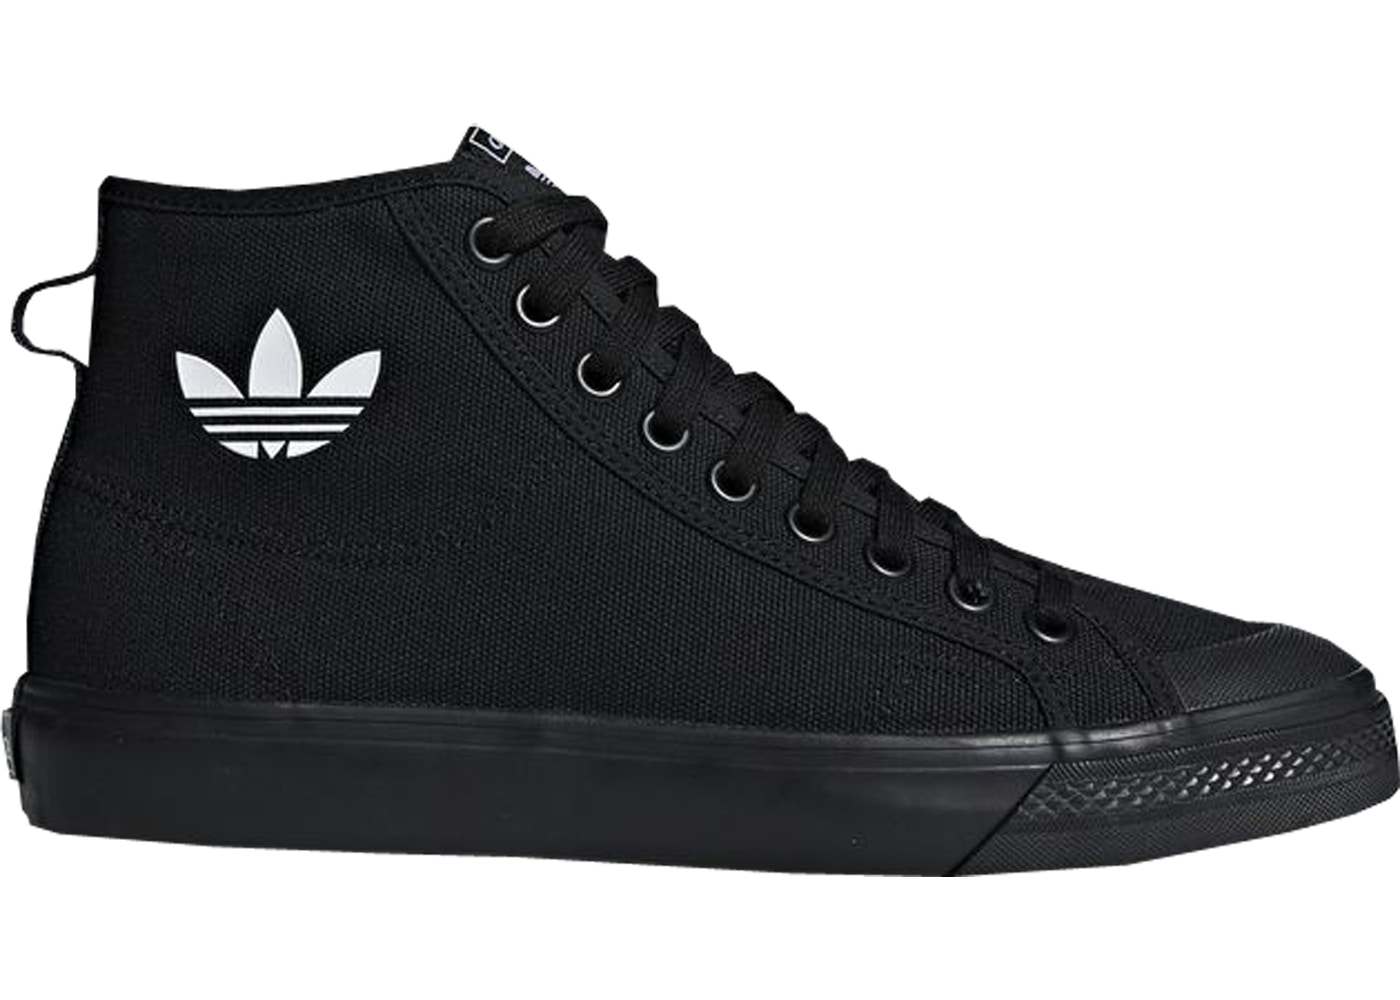 sale retailer b315e edc27 adidas Nizza Hi Core Black - B41651